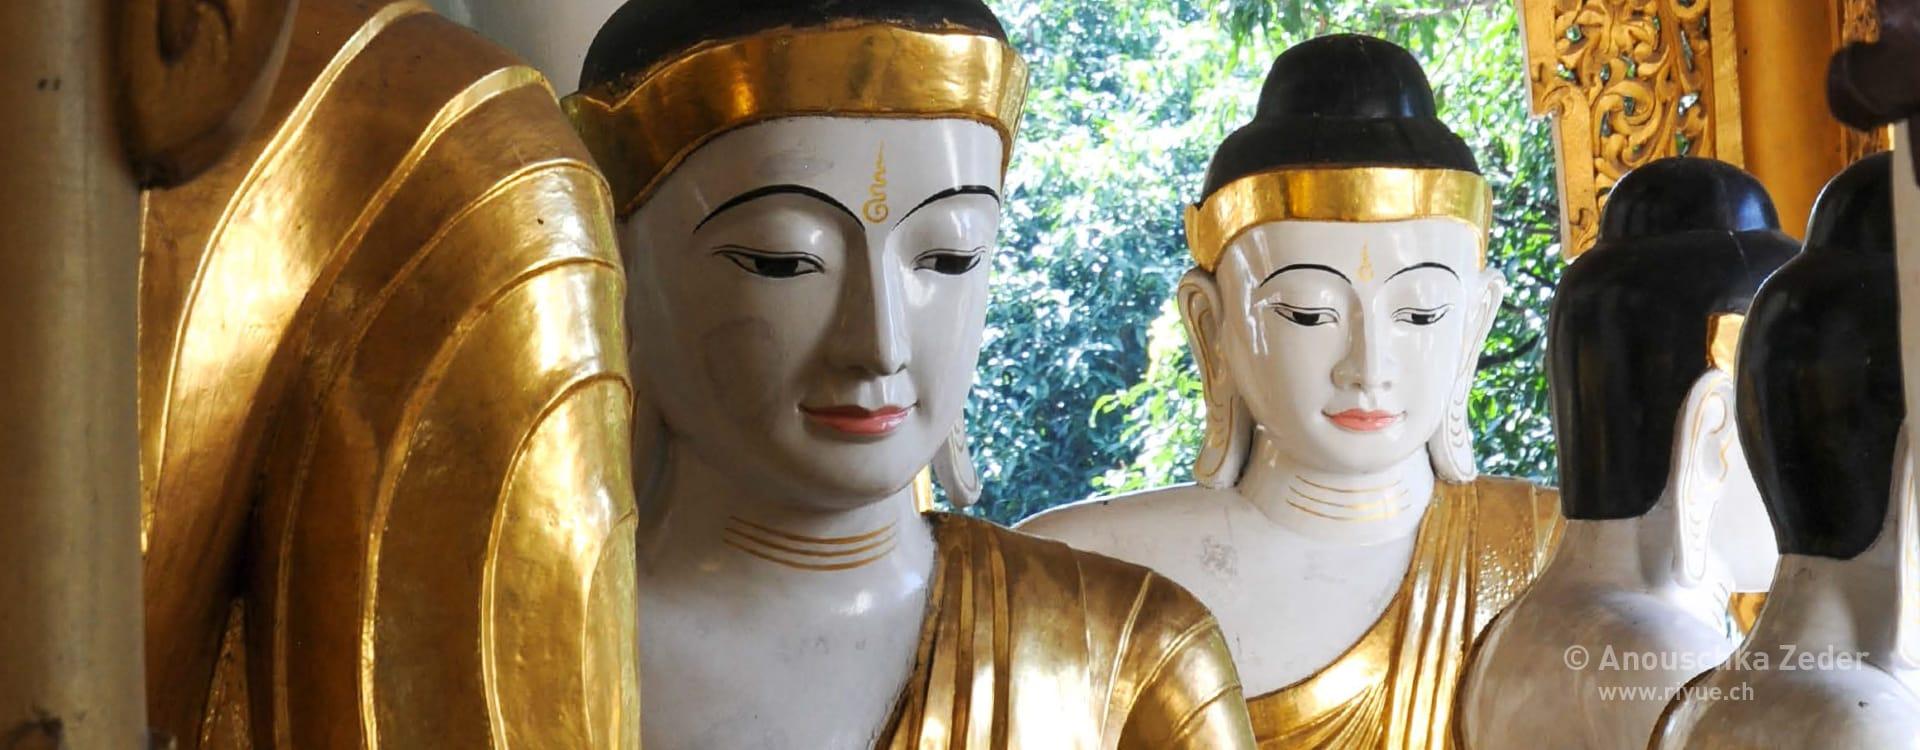 riyue – Anamnese – Buddhas Myanmar